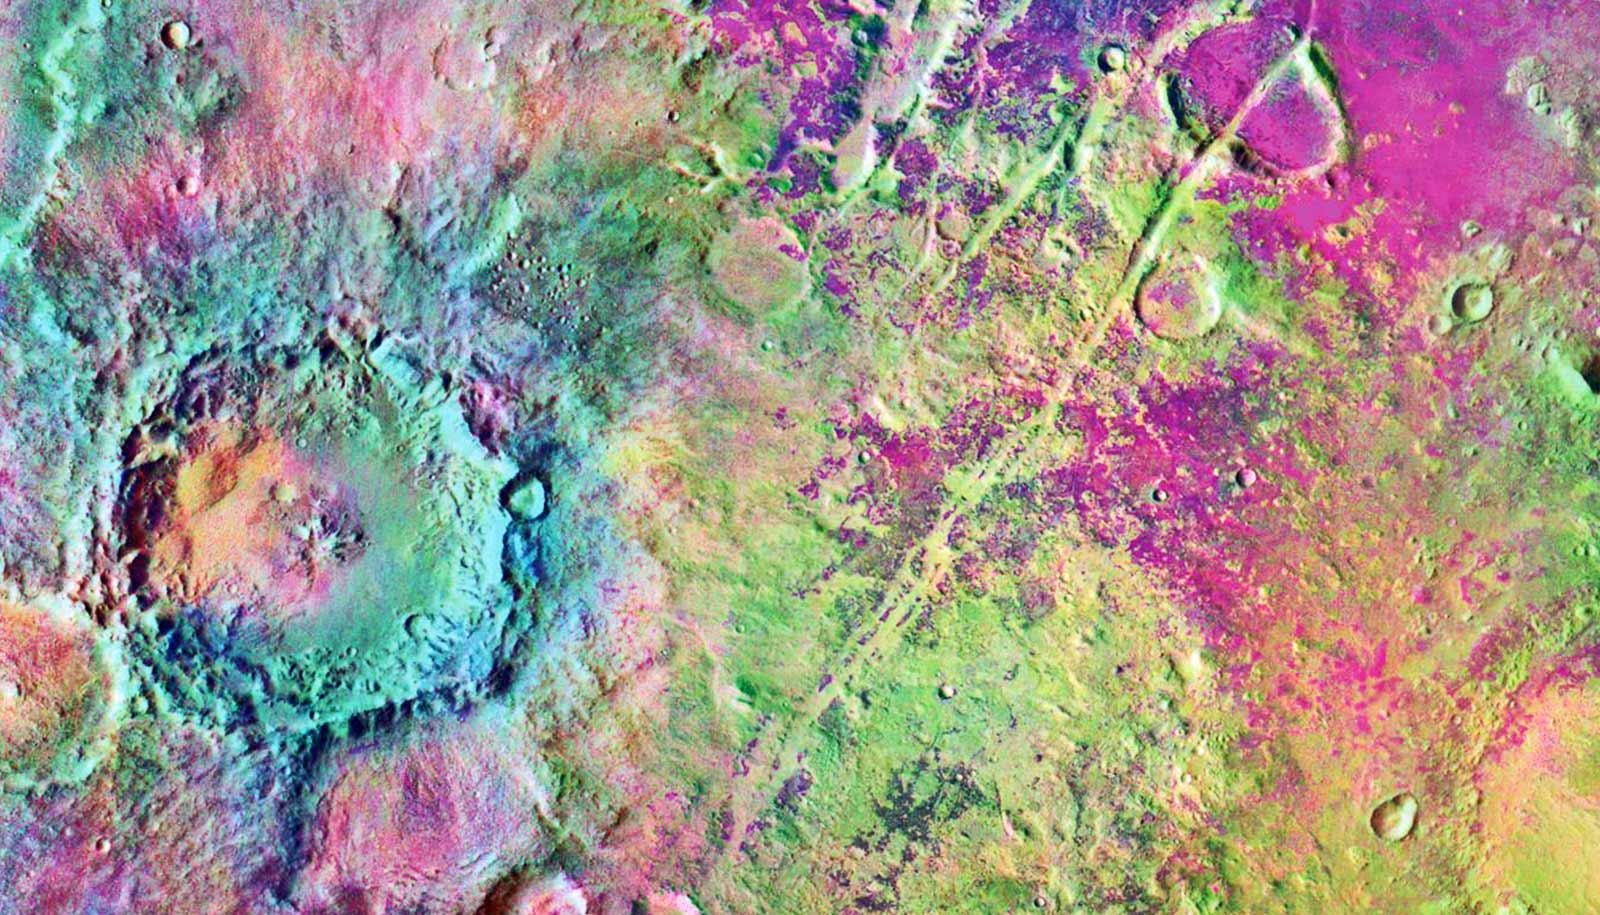 Nili Fossae mineral deposit